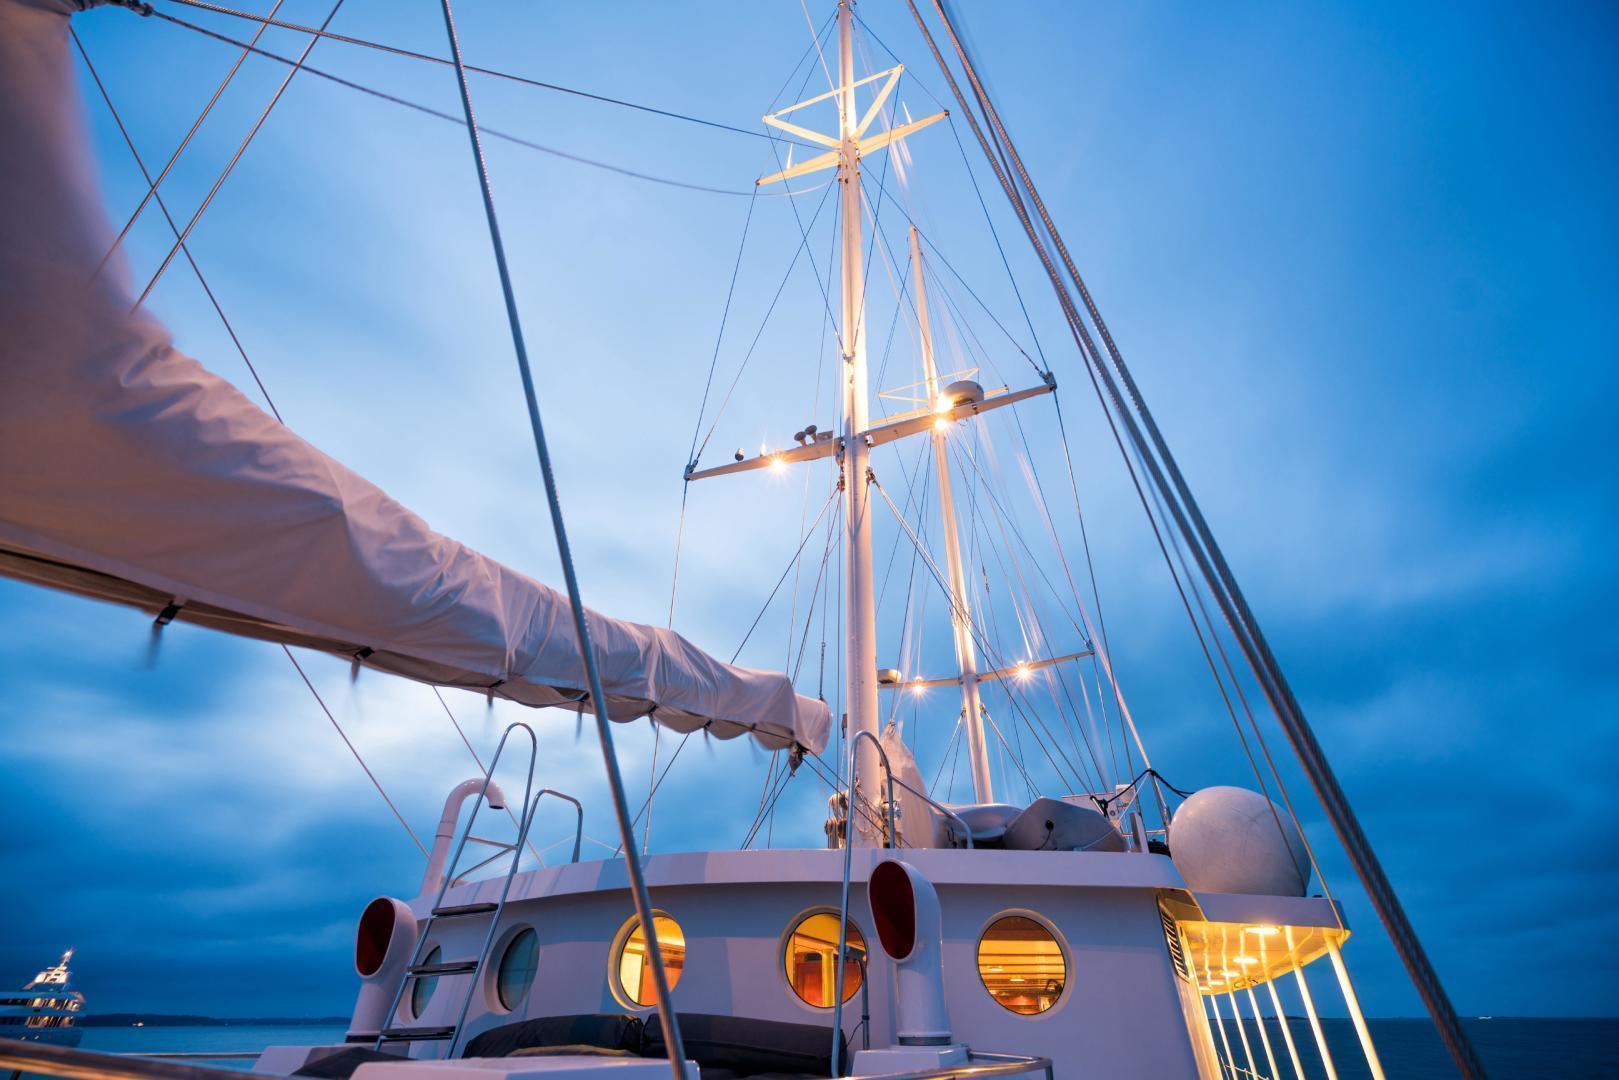 Palmer Johnson-Tri-Masted Staysail 1983-Arabella  Newport-Rhode Island-United States-1355676 | Thumbnail